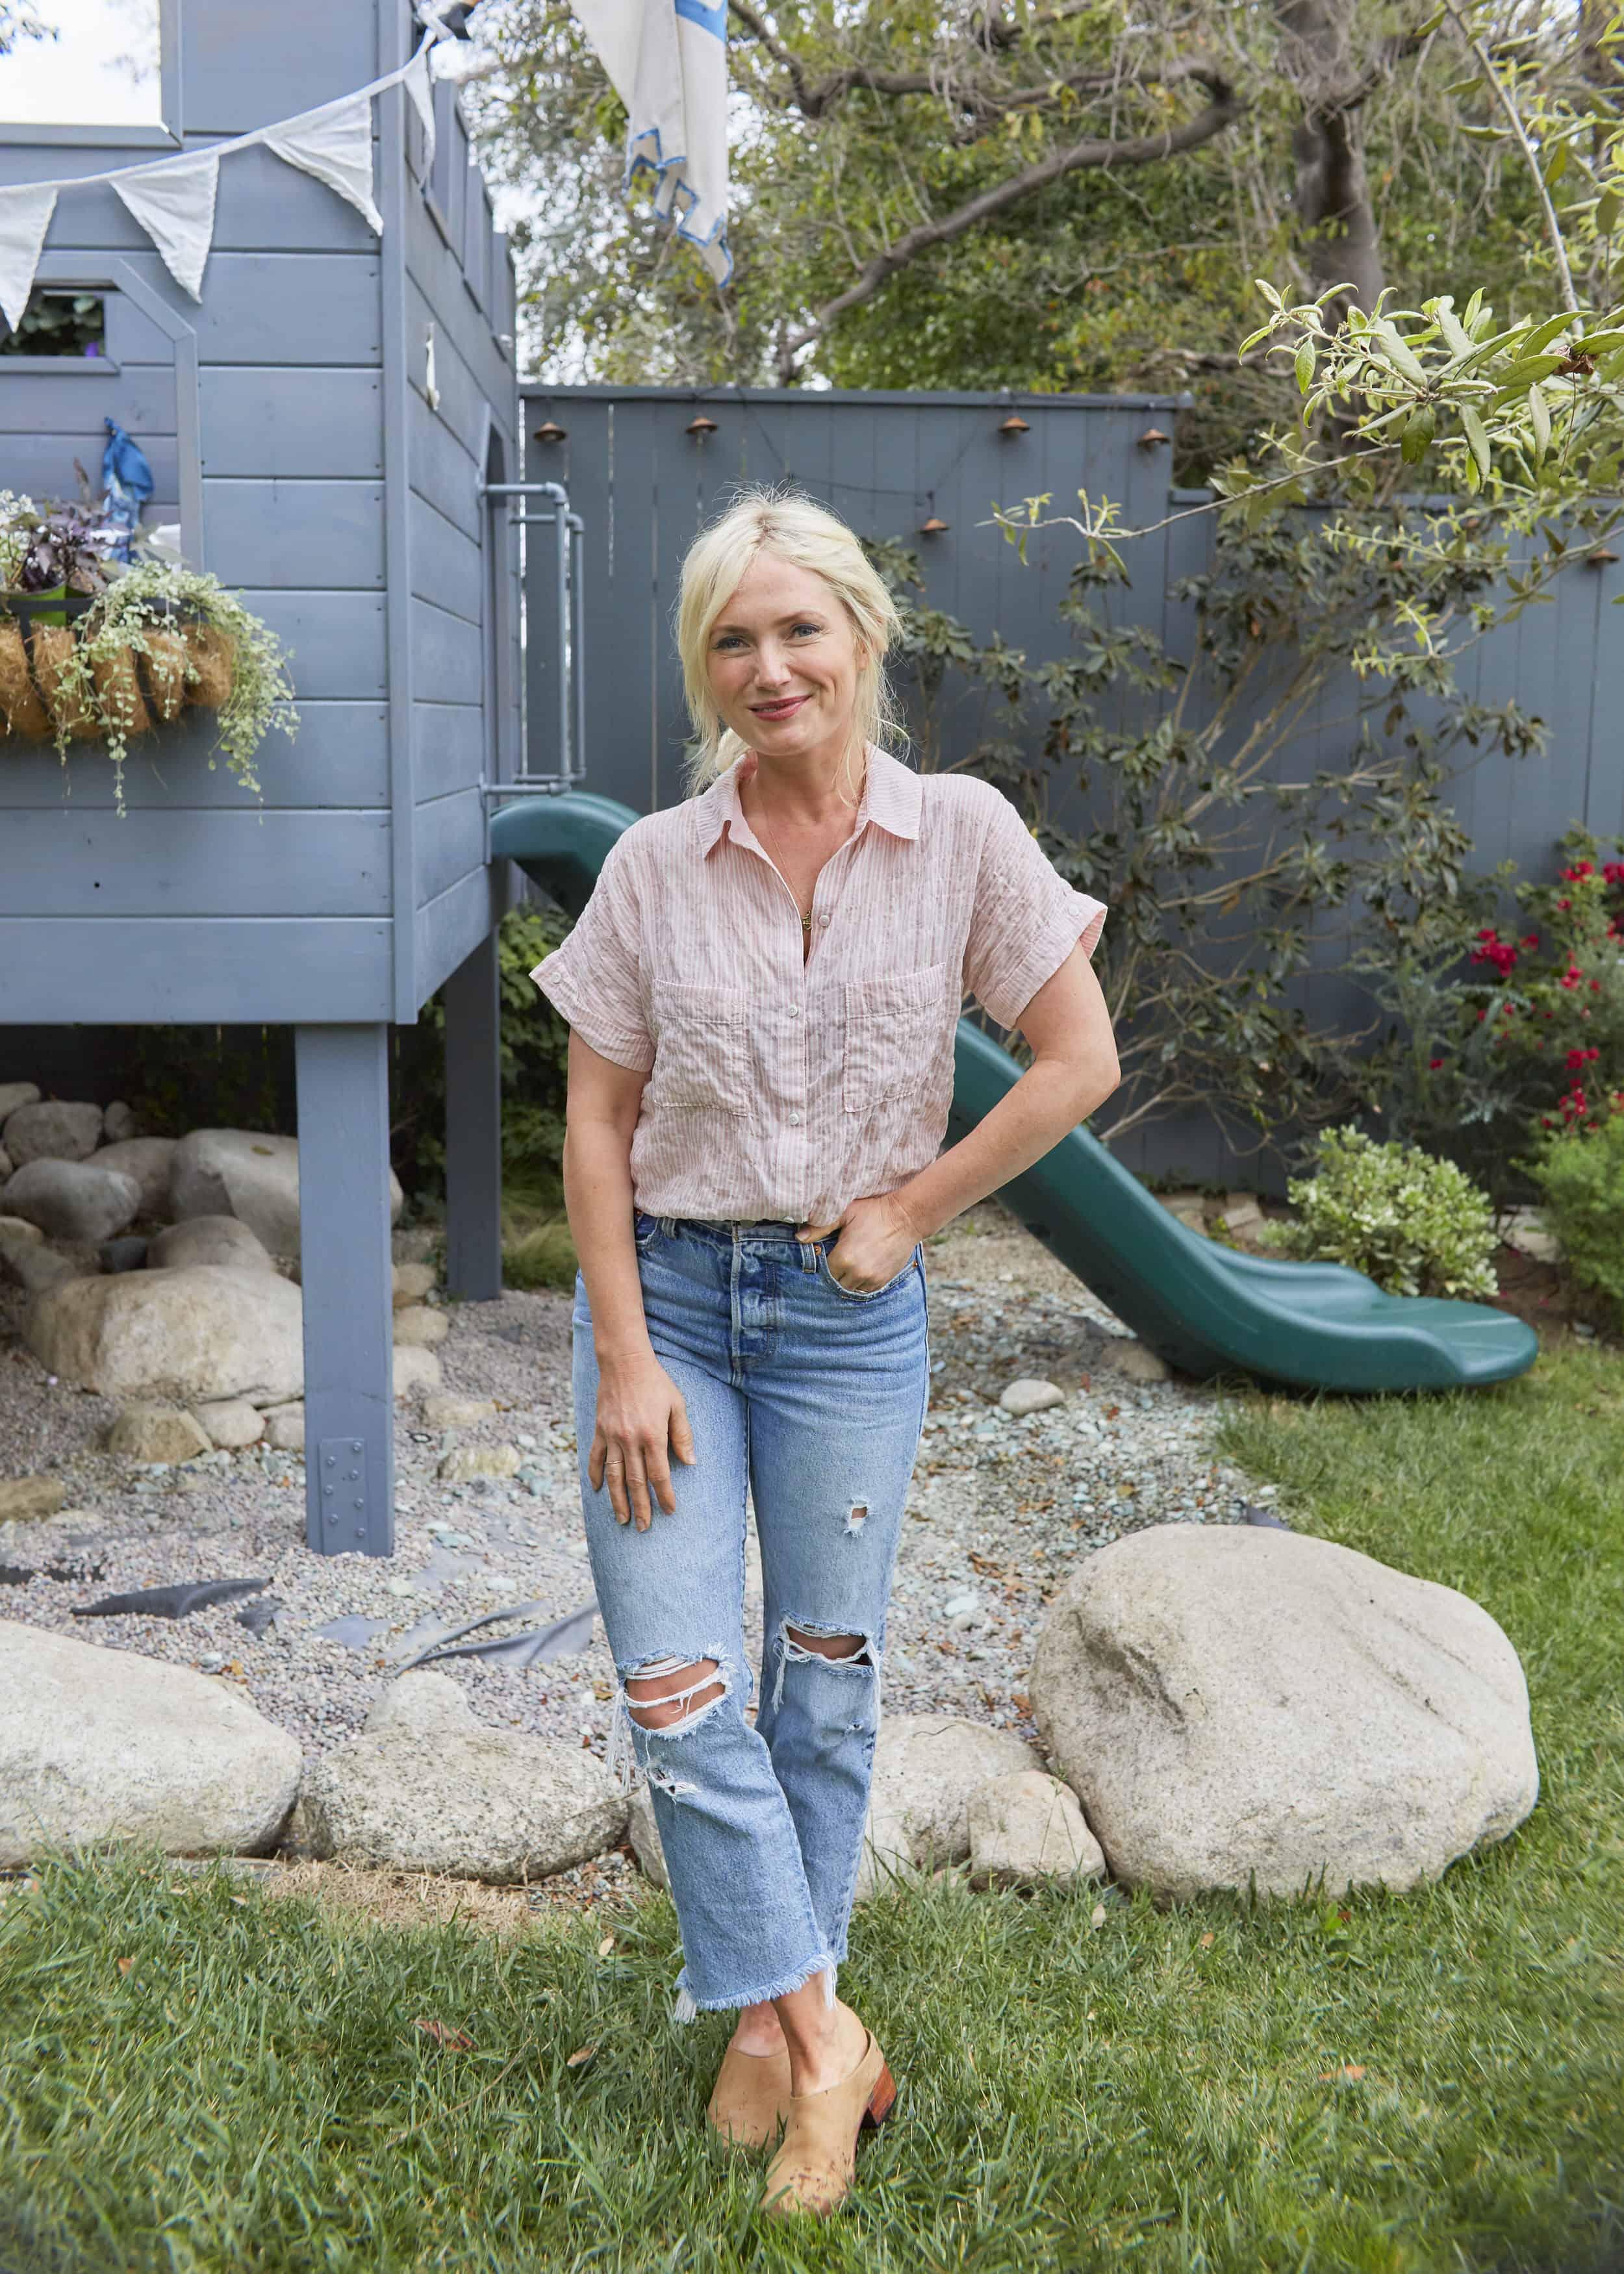 Emily Henderson Summer Fashion Basics Levis Wedgie Fit Jean Pink Stripe Blouse